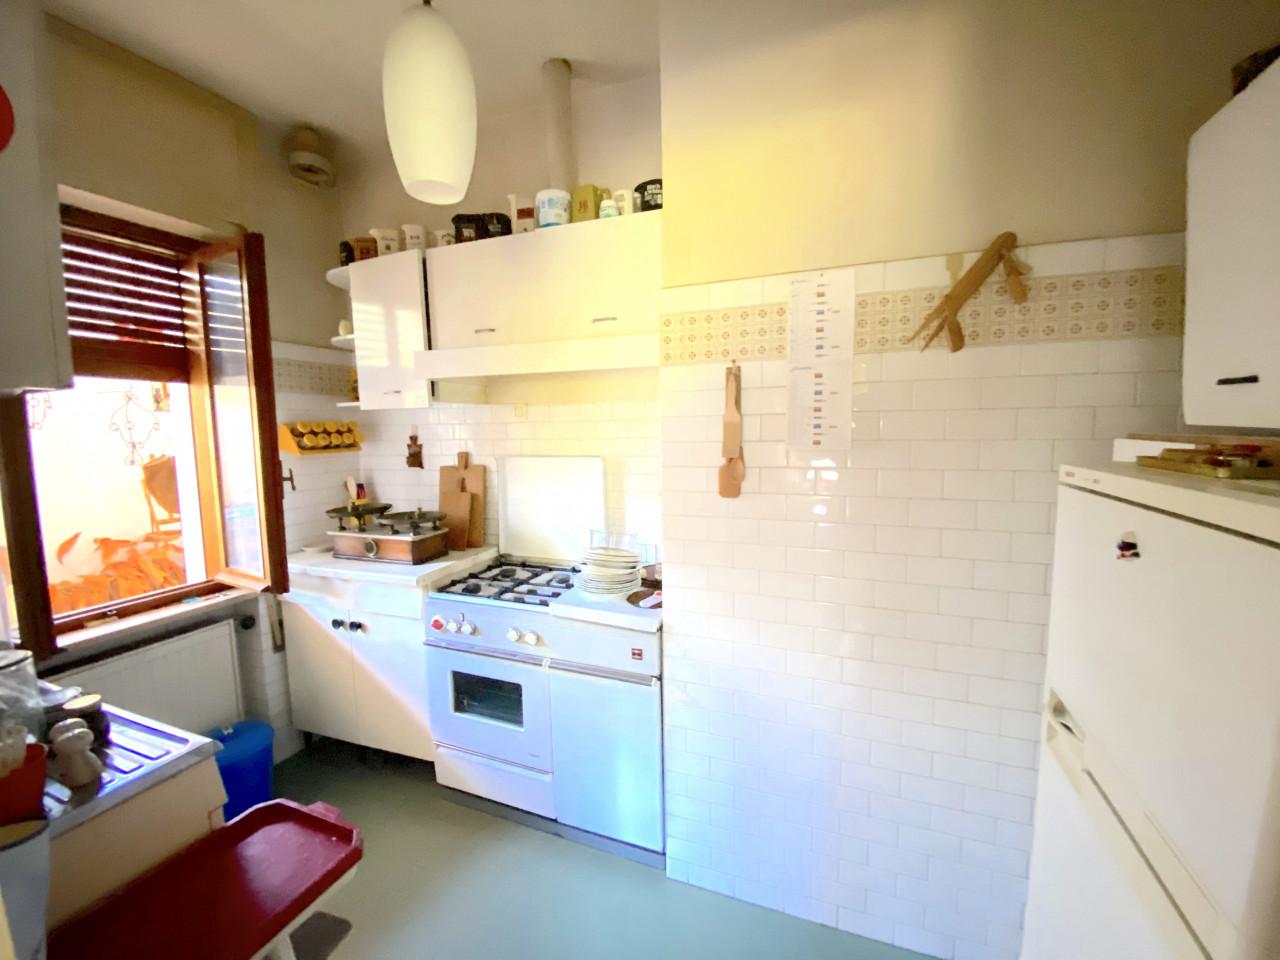 Casa singola con capannone in vendita in centro a Budoia - Rif. V.D.1 https://images.gestionaleimmobiliare.it/foto/annunci/200702/2265893/1280x1280/007__img_2977.jpg